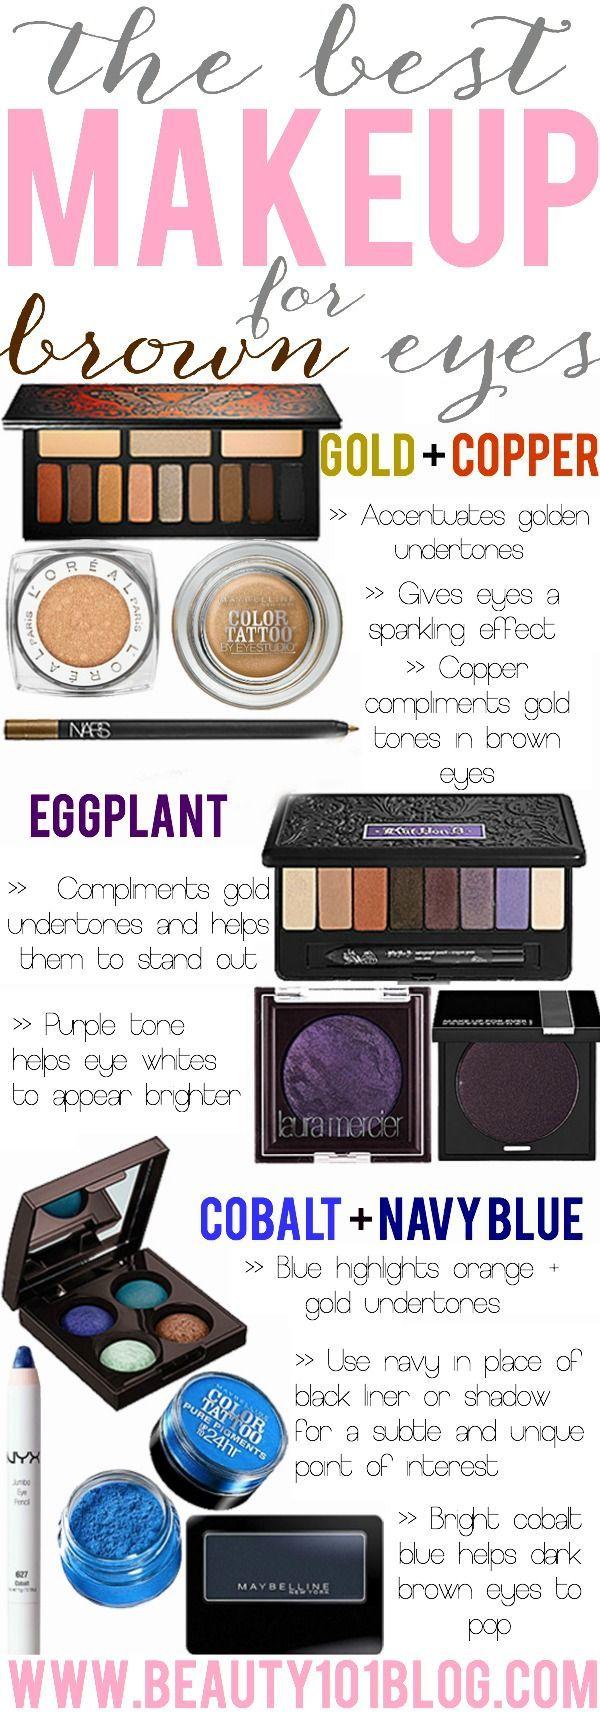 The Best Makeup for Brown Eyes | Beauty 101 Blog | Bloglovin'